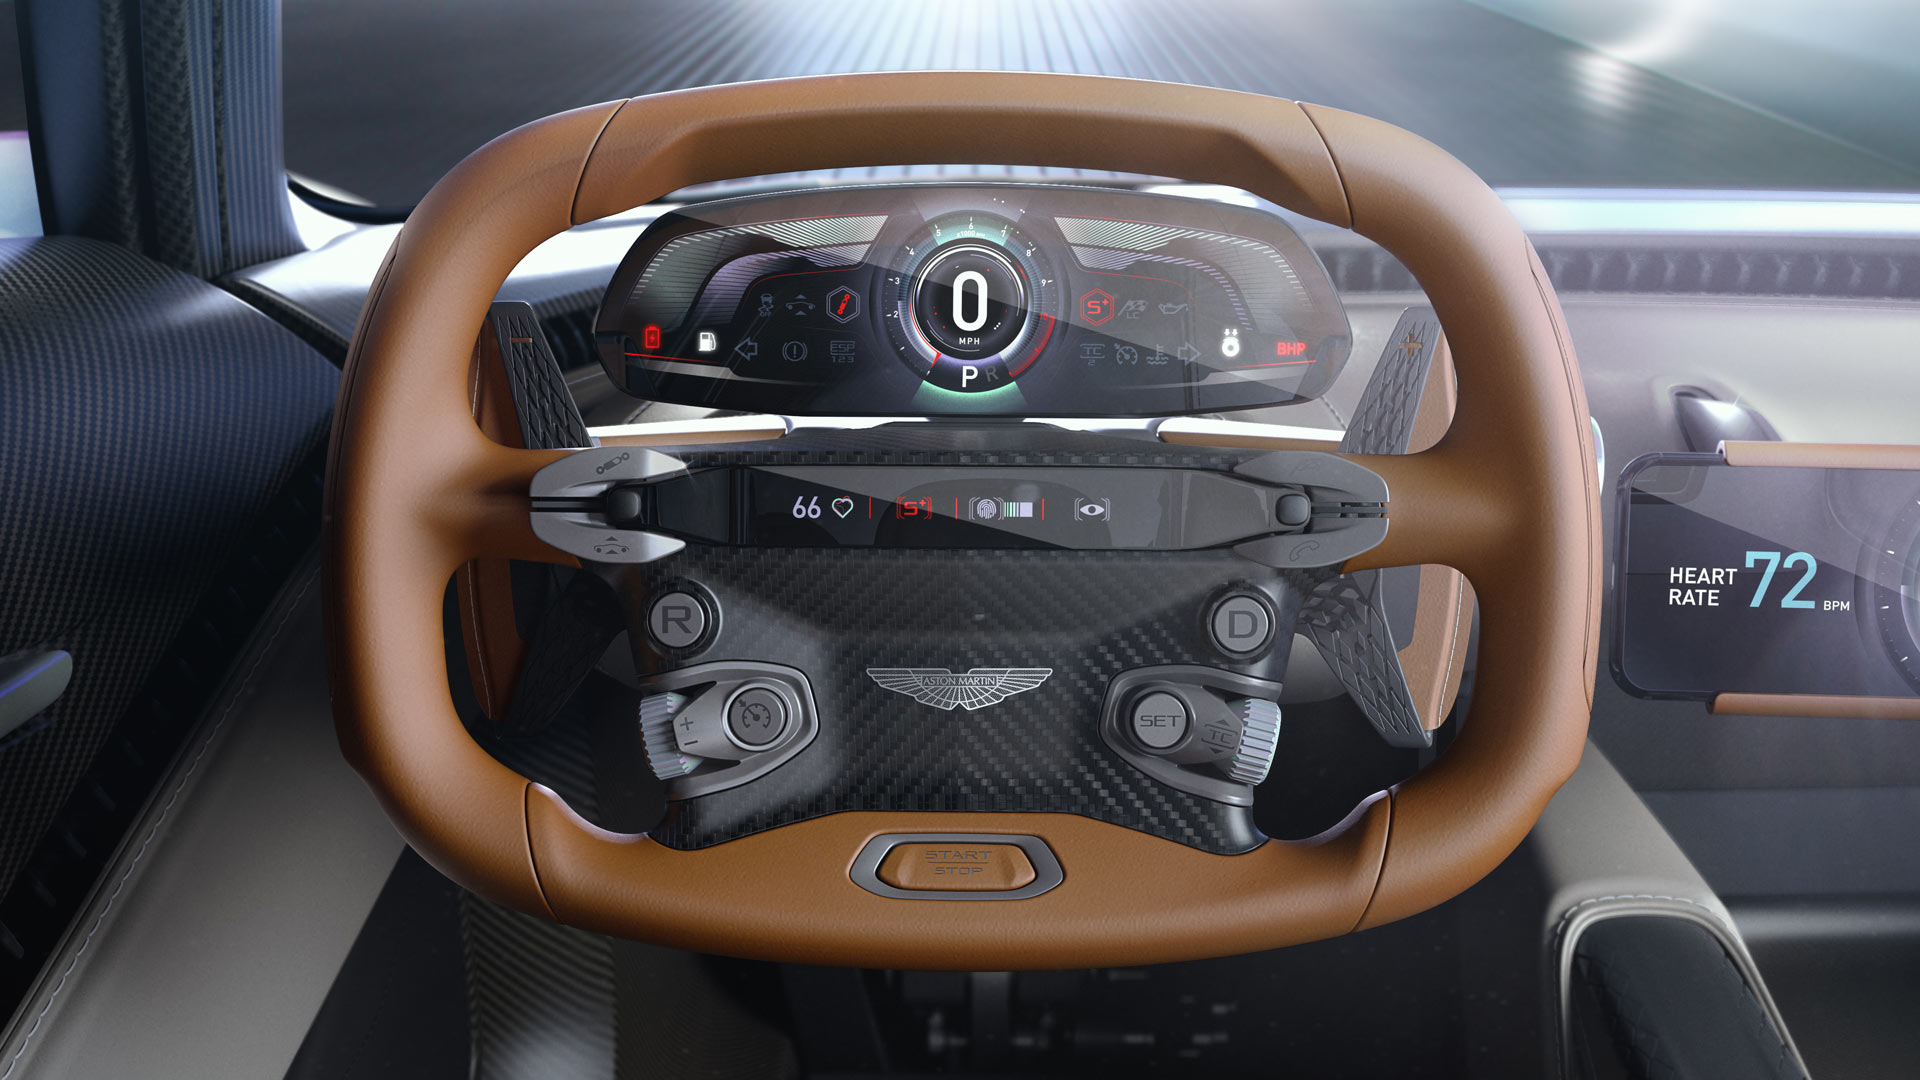 Aston Martin AM-RB 003 Interior Steering Wheel Instrument Cluster Display